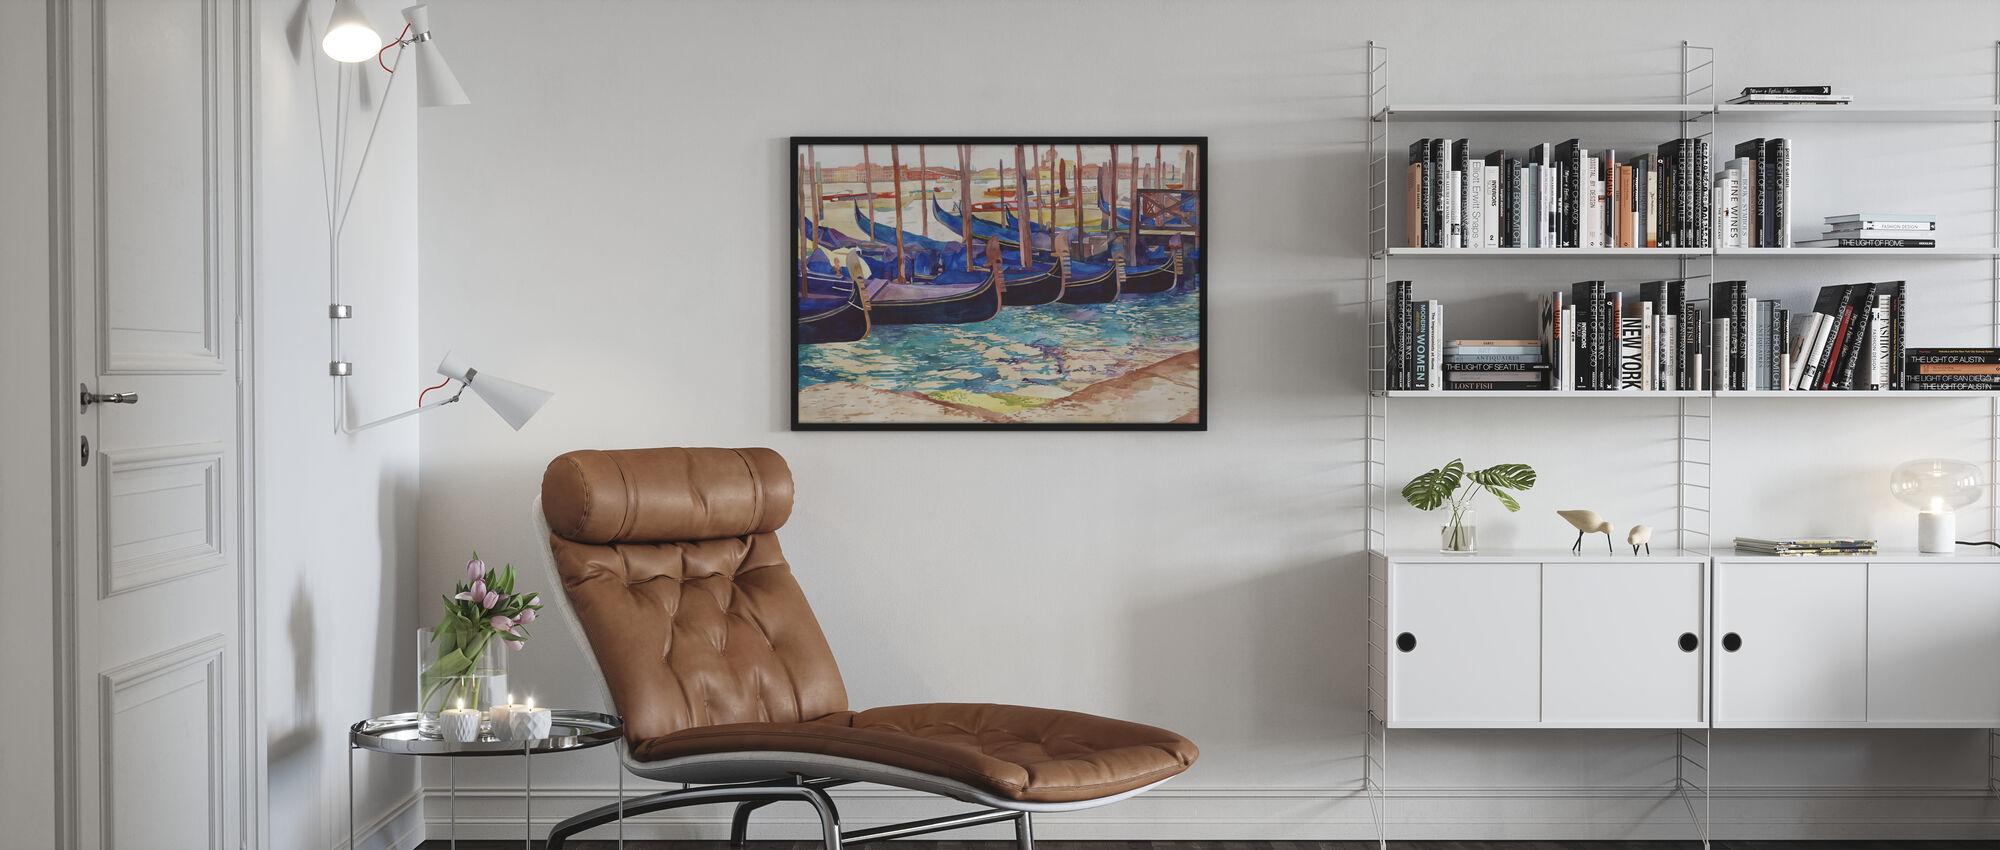 Gondolas in Venice - Poster - Living Room